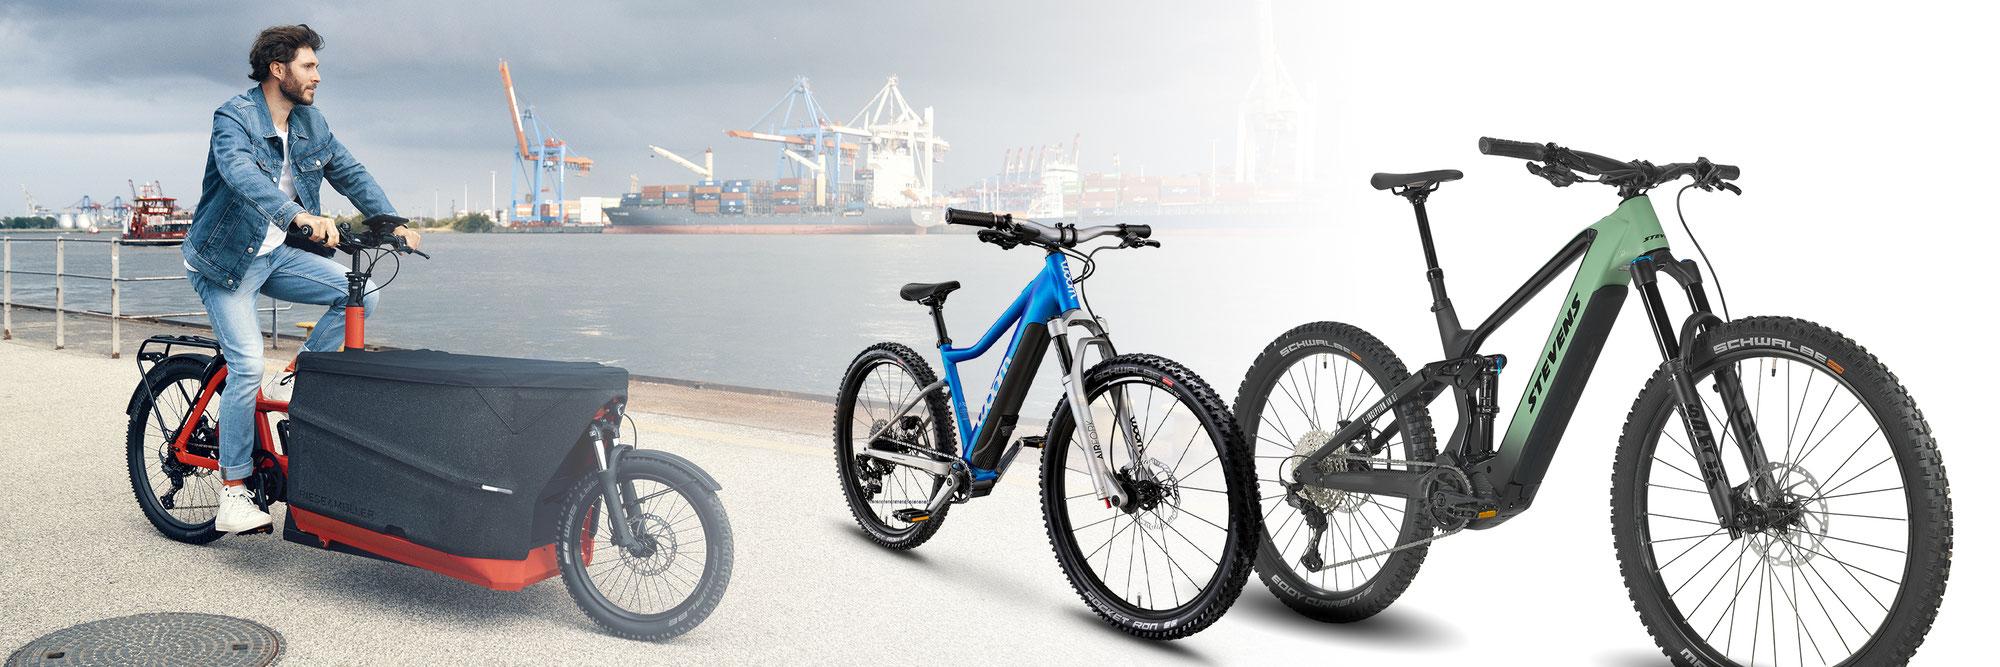 Bike Neuheiten – Das erwartet dich 2021